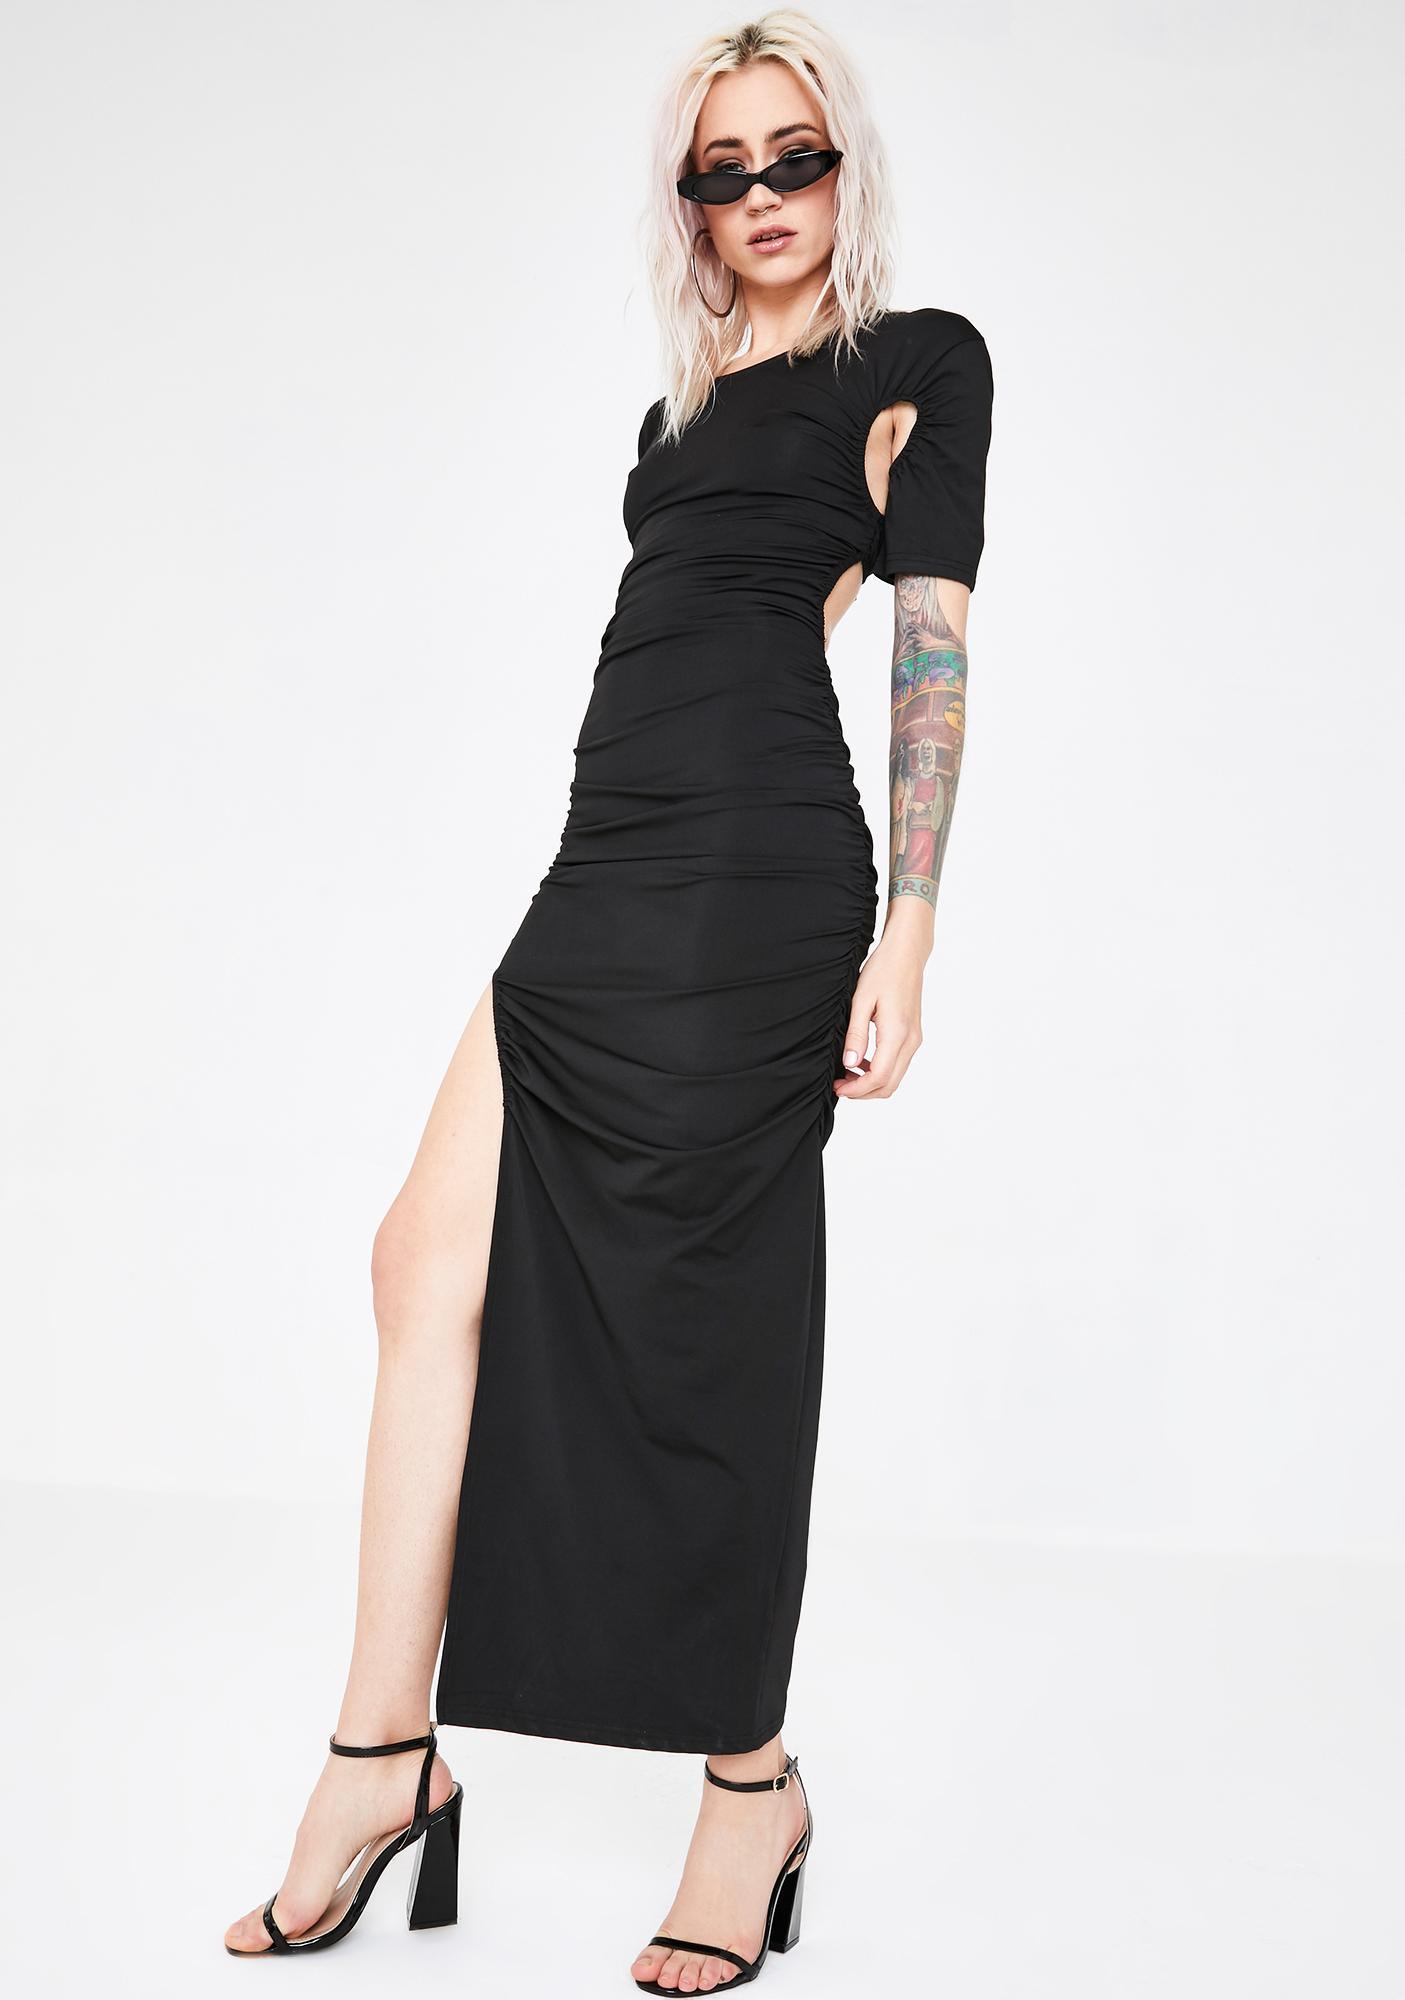 Lioness Hips Don't Lie Maxi Dress